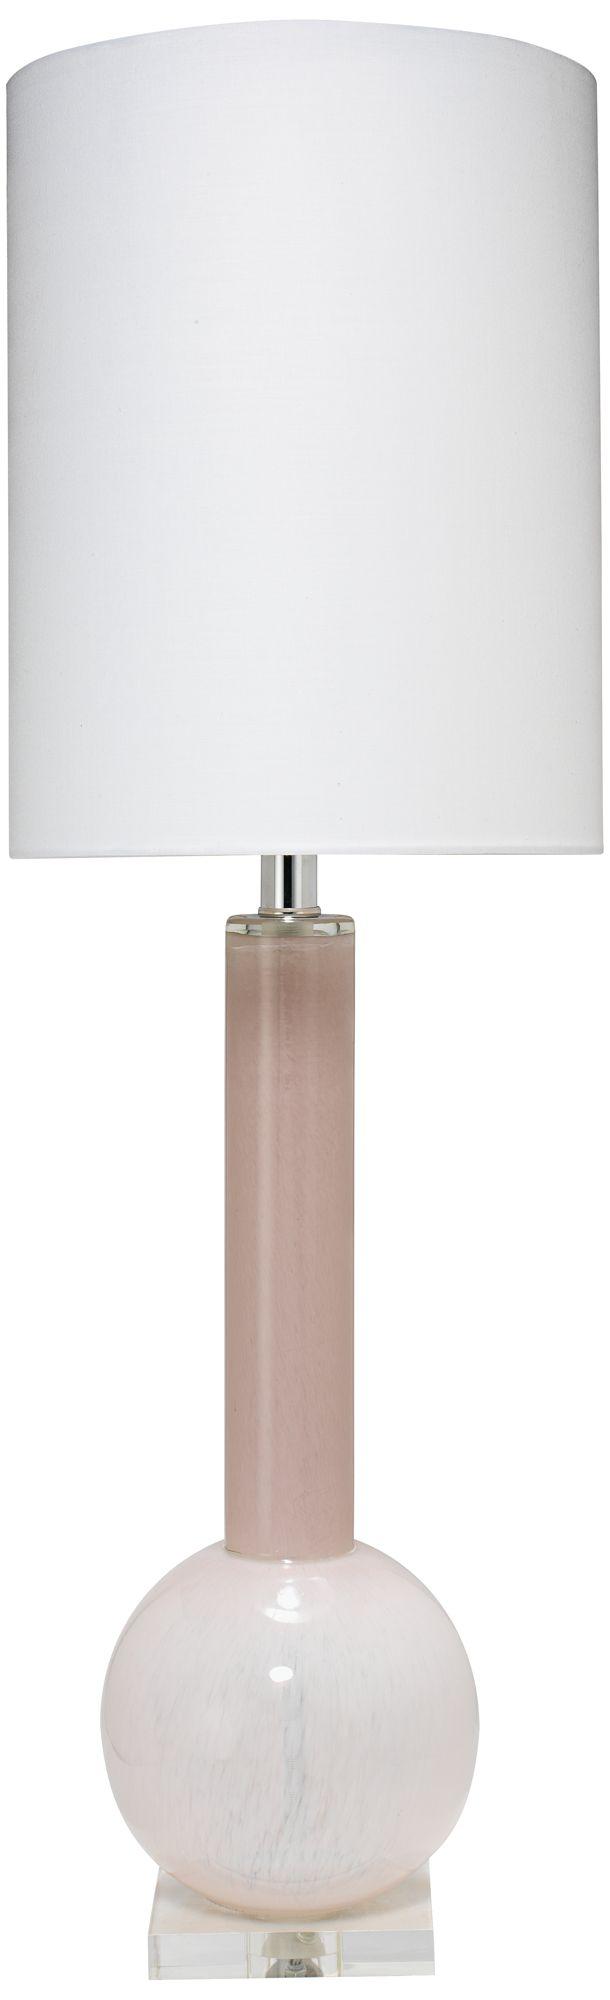 Jamie Young Studio Petal Pink Glass Table Lamp